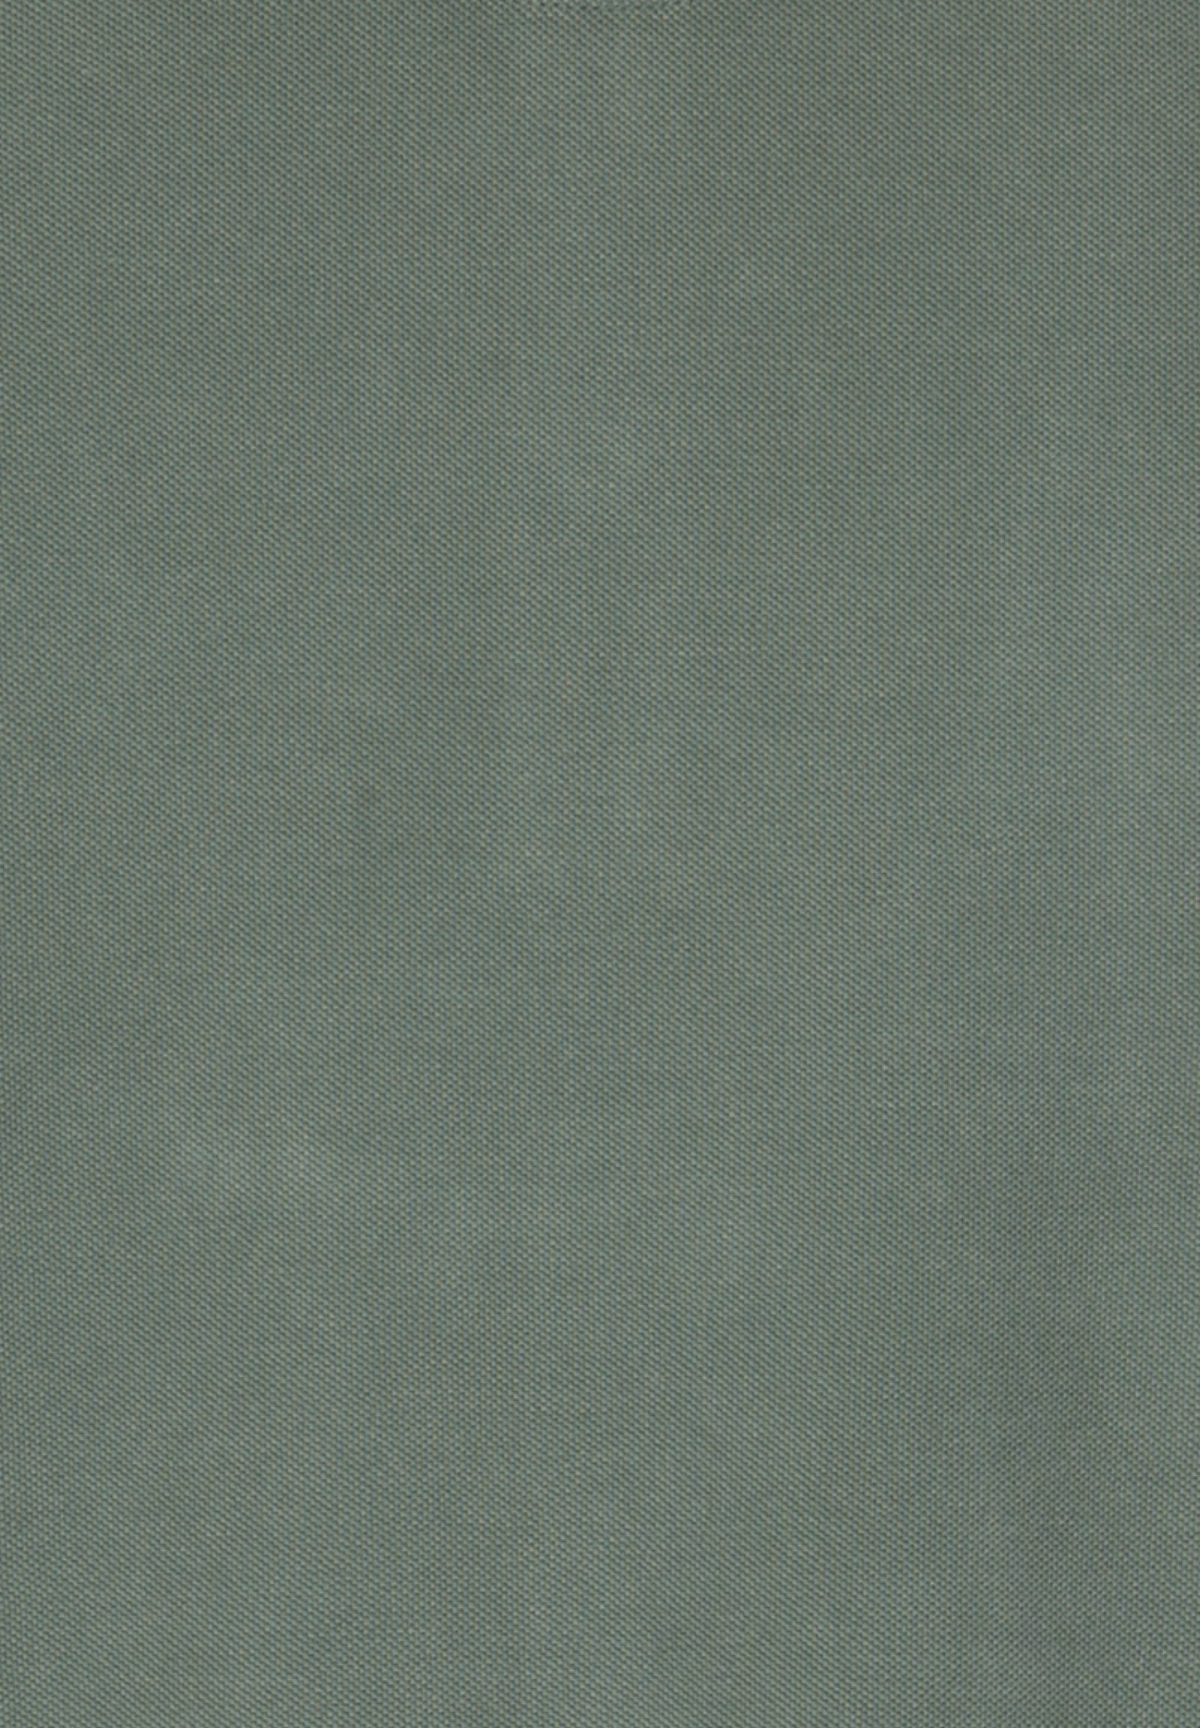 Camel-Active-Herren-Shirt-Poloshirt-Pique-Regular-Fit-NEU Indexbild 86